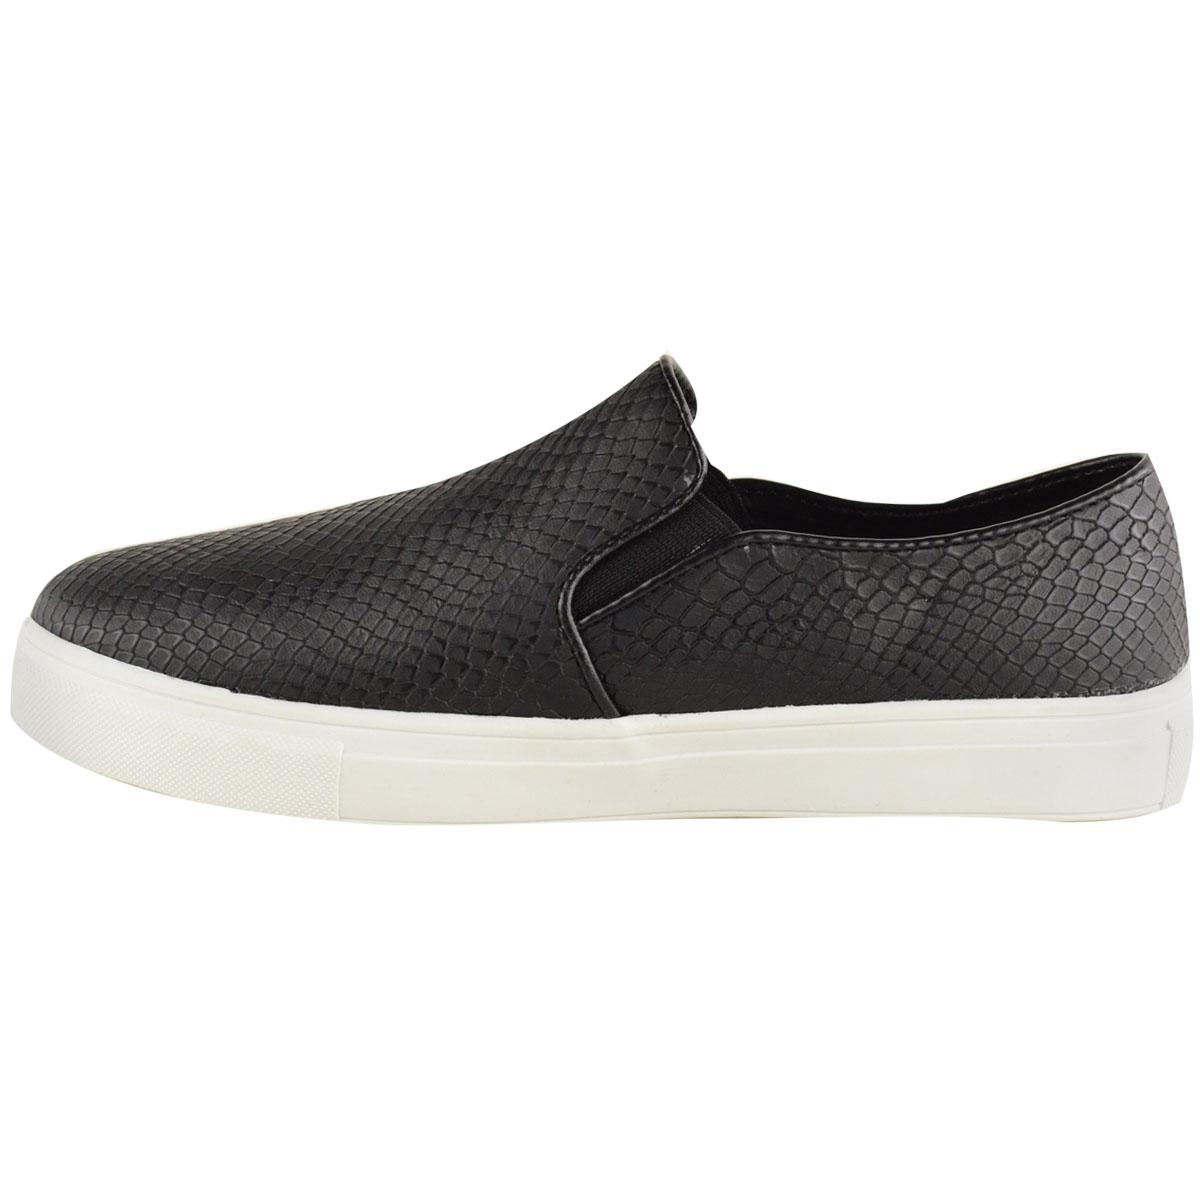 Effective Use Of Fashionable Cream Heels